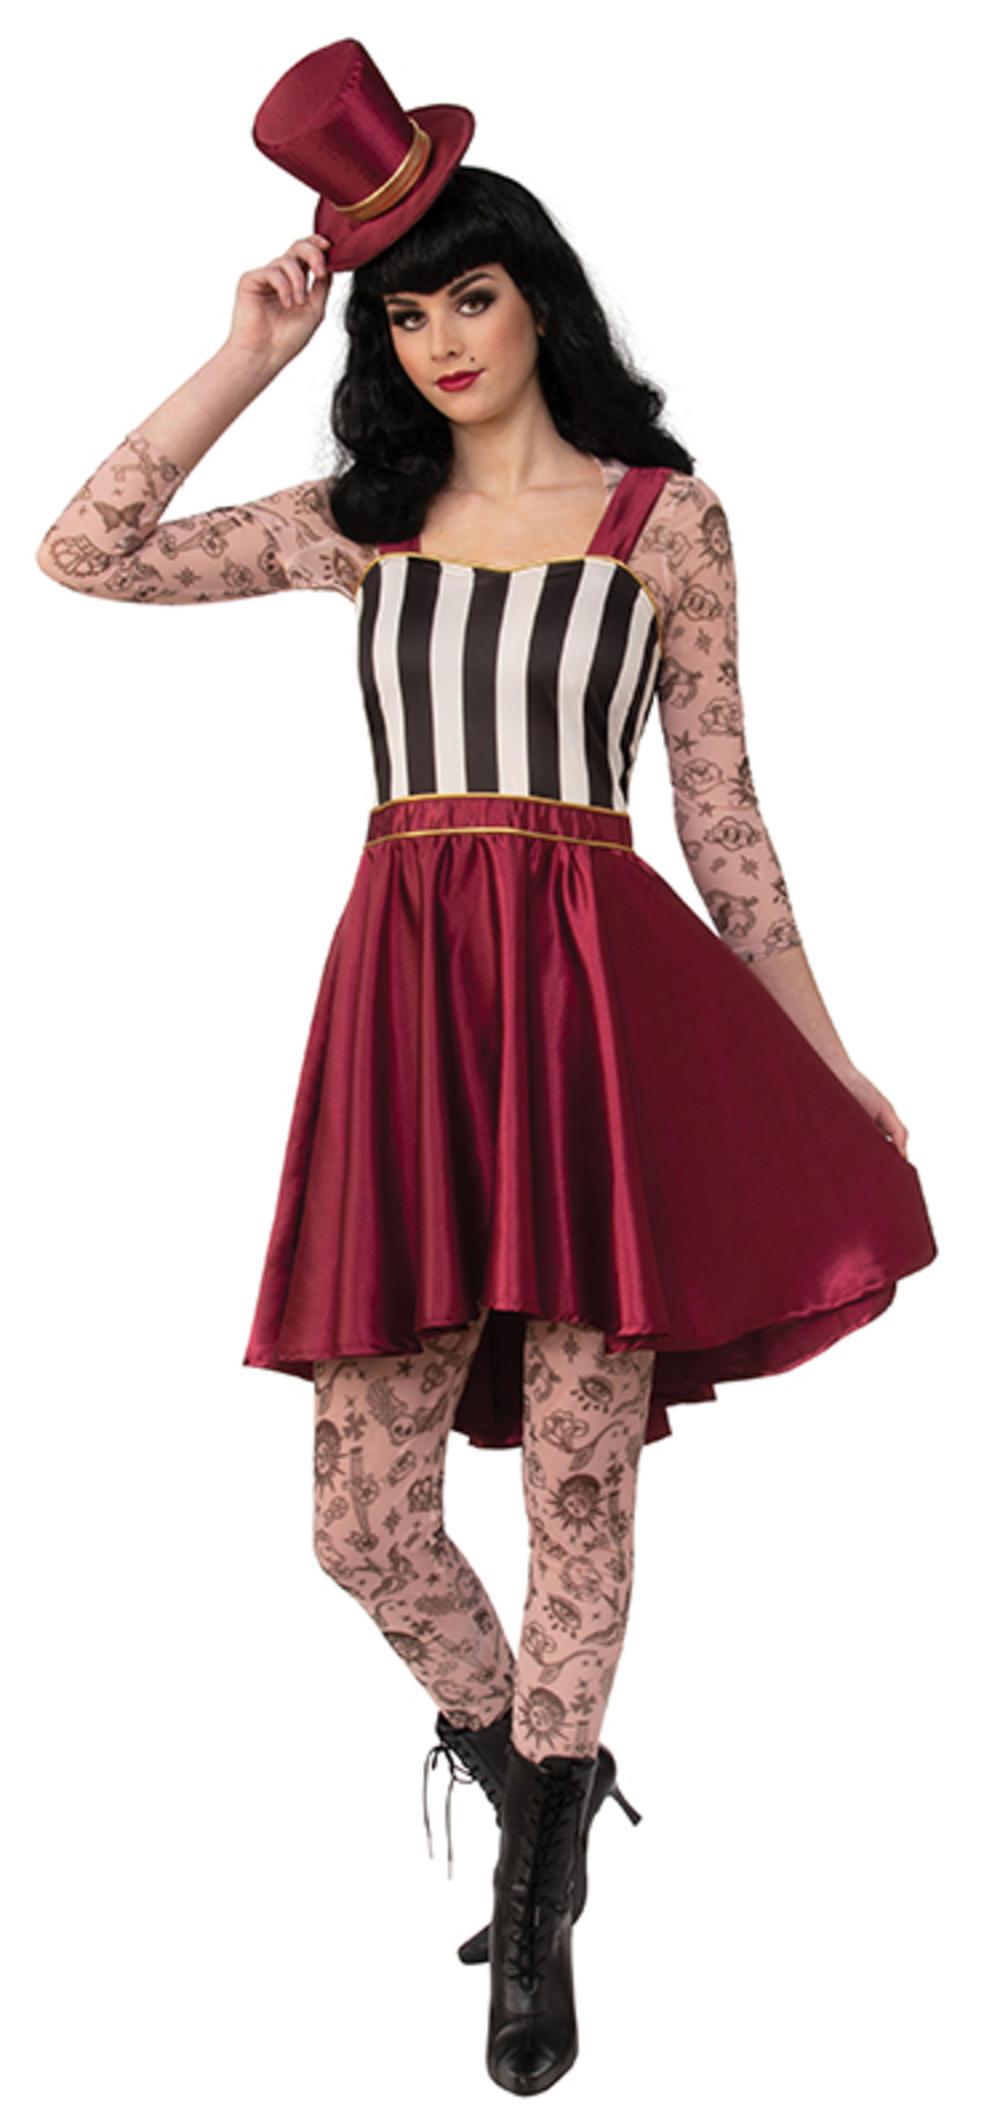 Tattooed Lady Costume